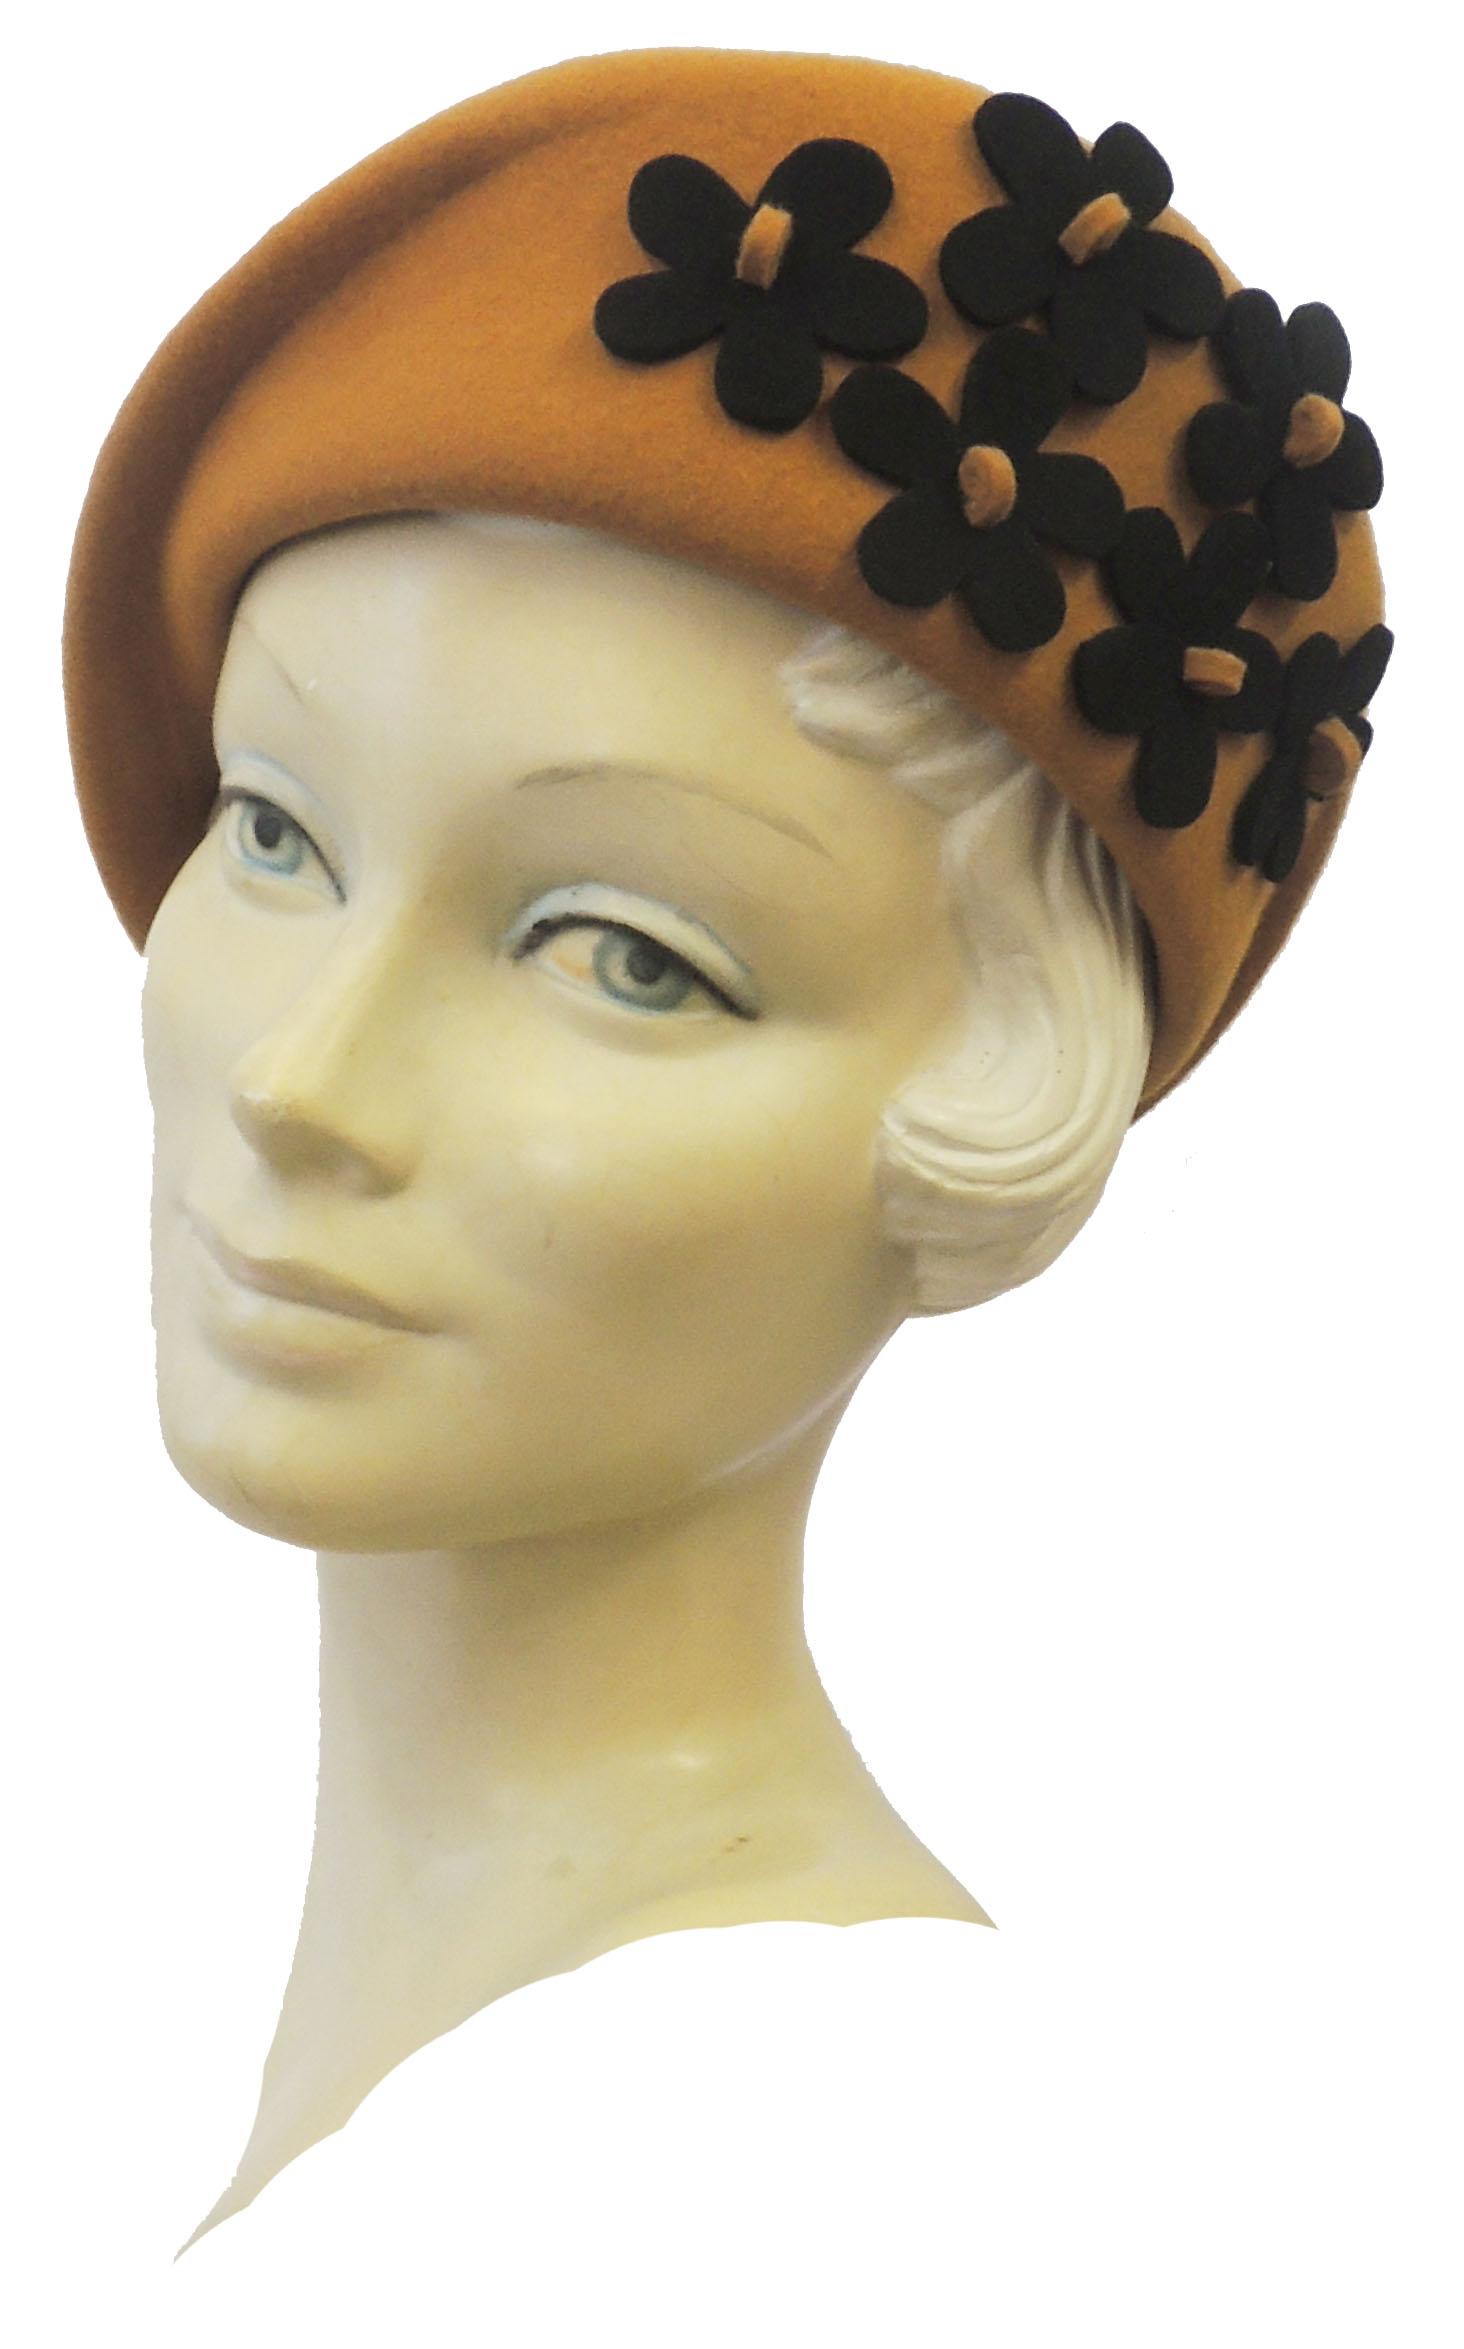 1940s Hats History 1930's 40's Landgirl WW2 Wartime Felt Flower Cloche Hat $32.99 AT vintagedancer.com